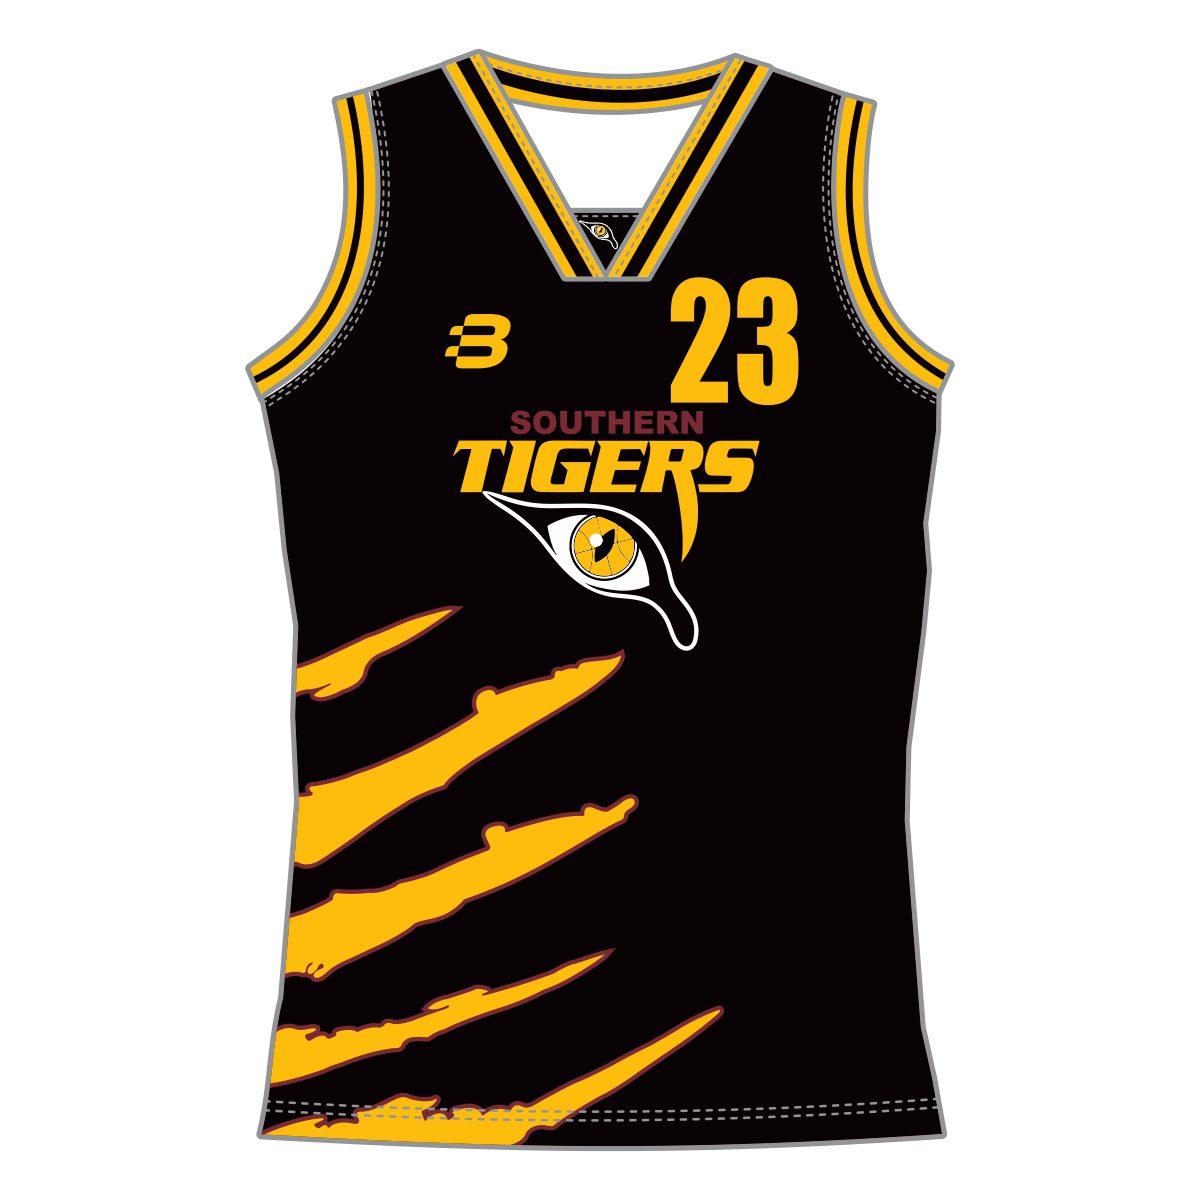 05b3c2cafb1 Southern Tigers Basketball Club - Girls Basketball Singlet (Black) -  VL65798 - Front